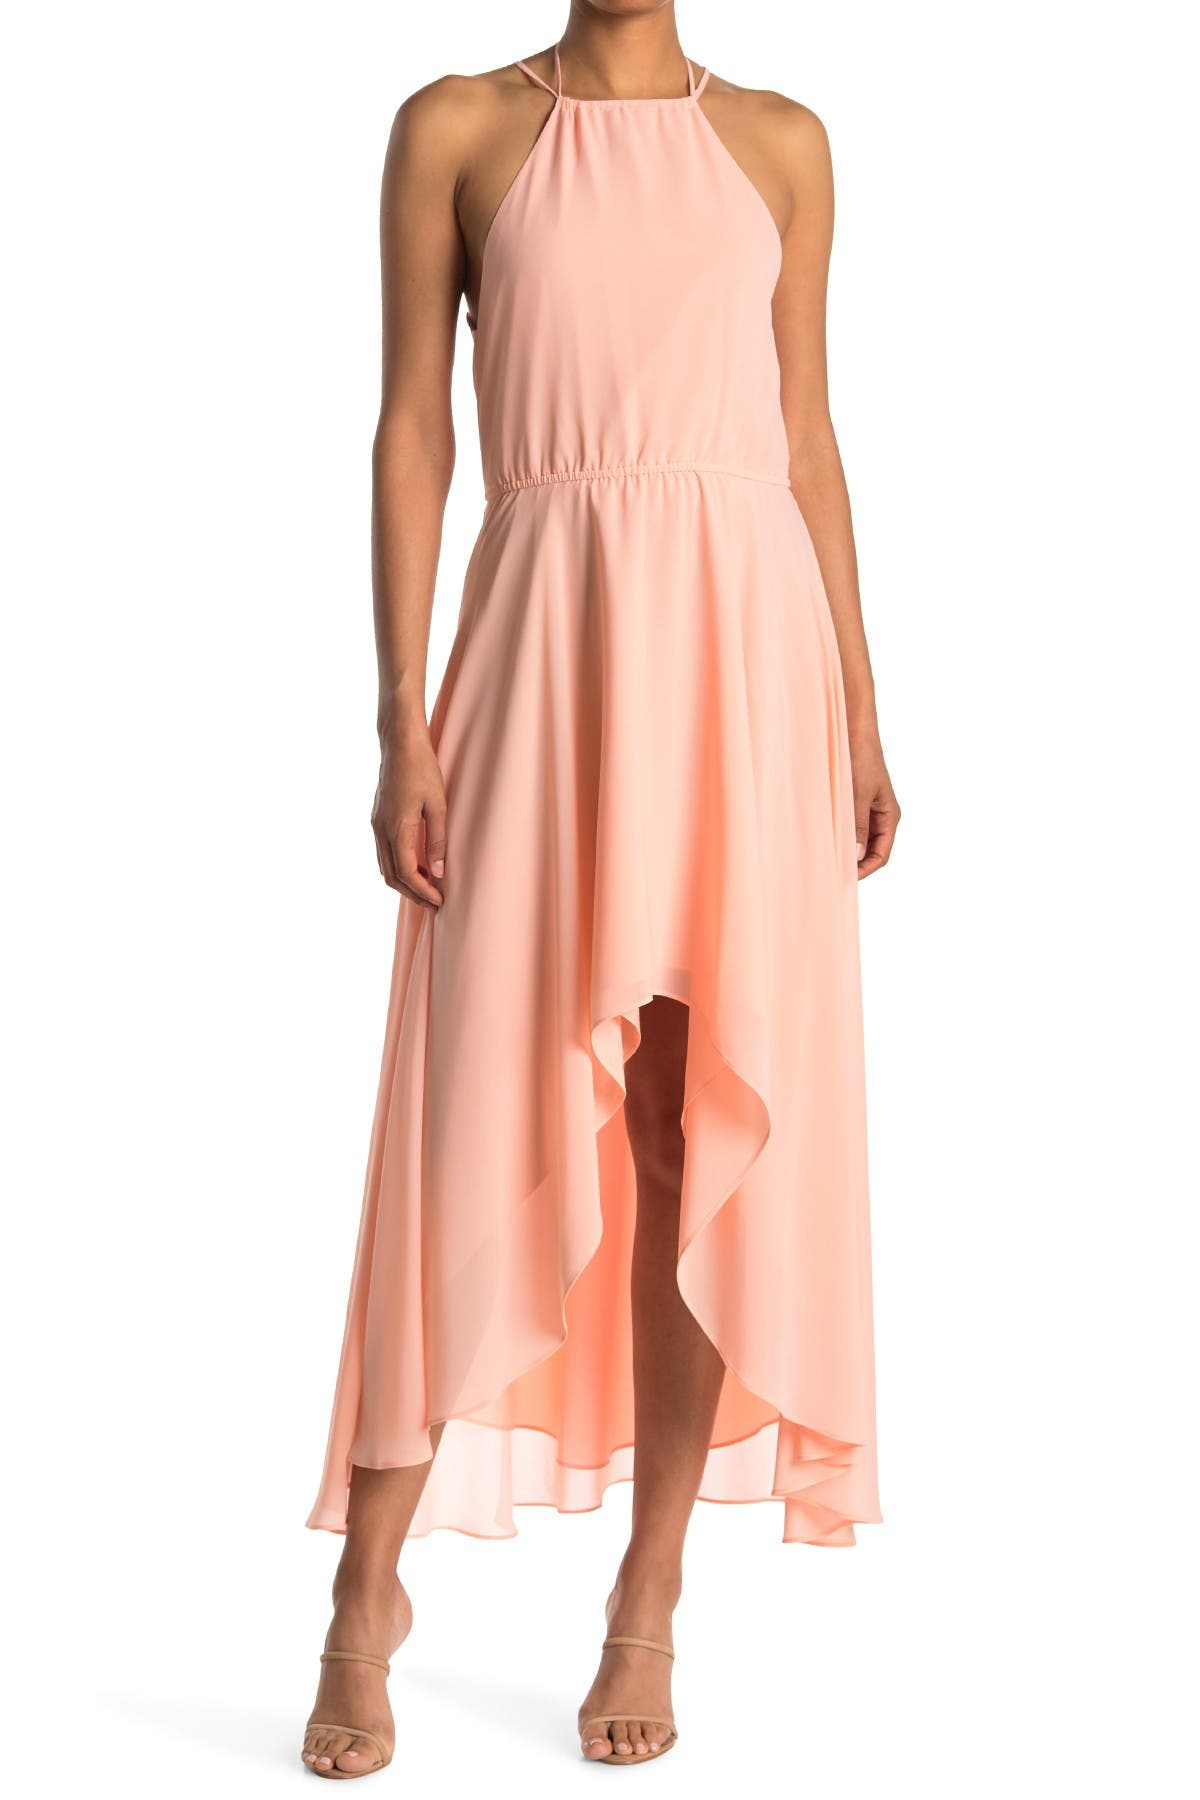 Image of HALSTON High Neck Dress